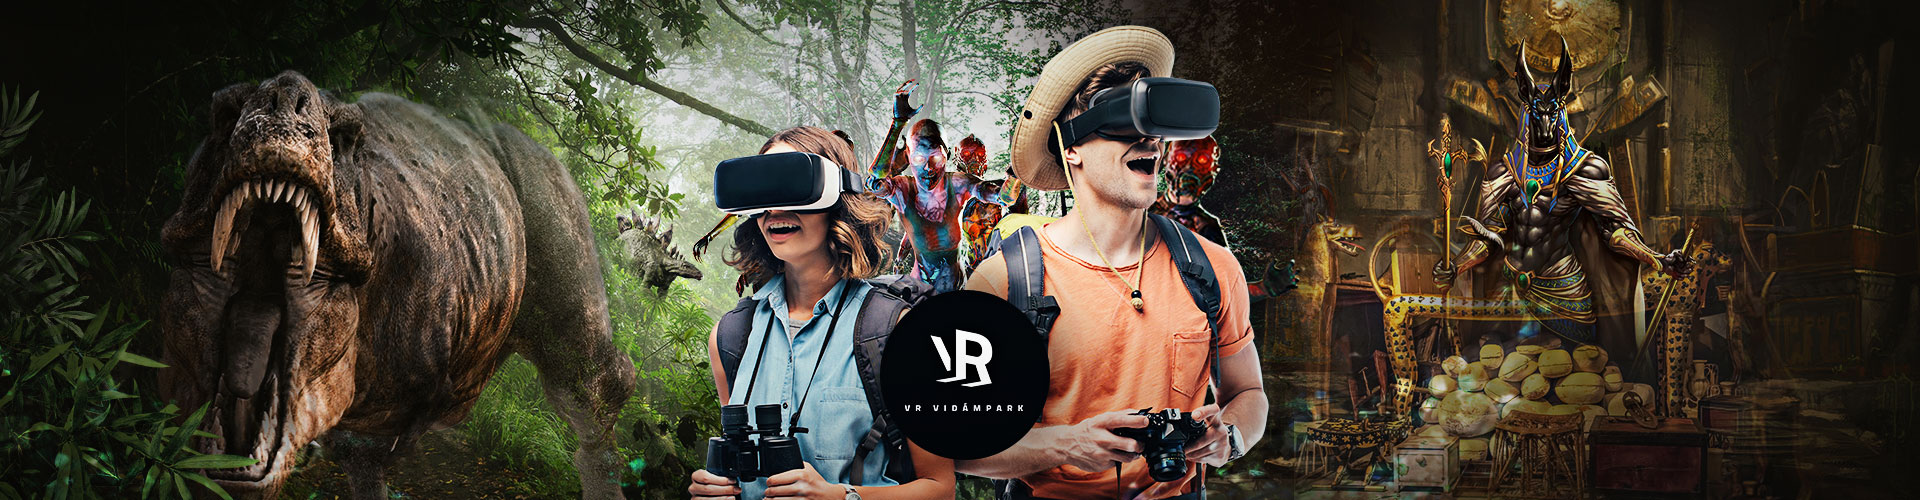 VR Vidámpark